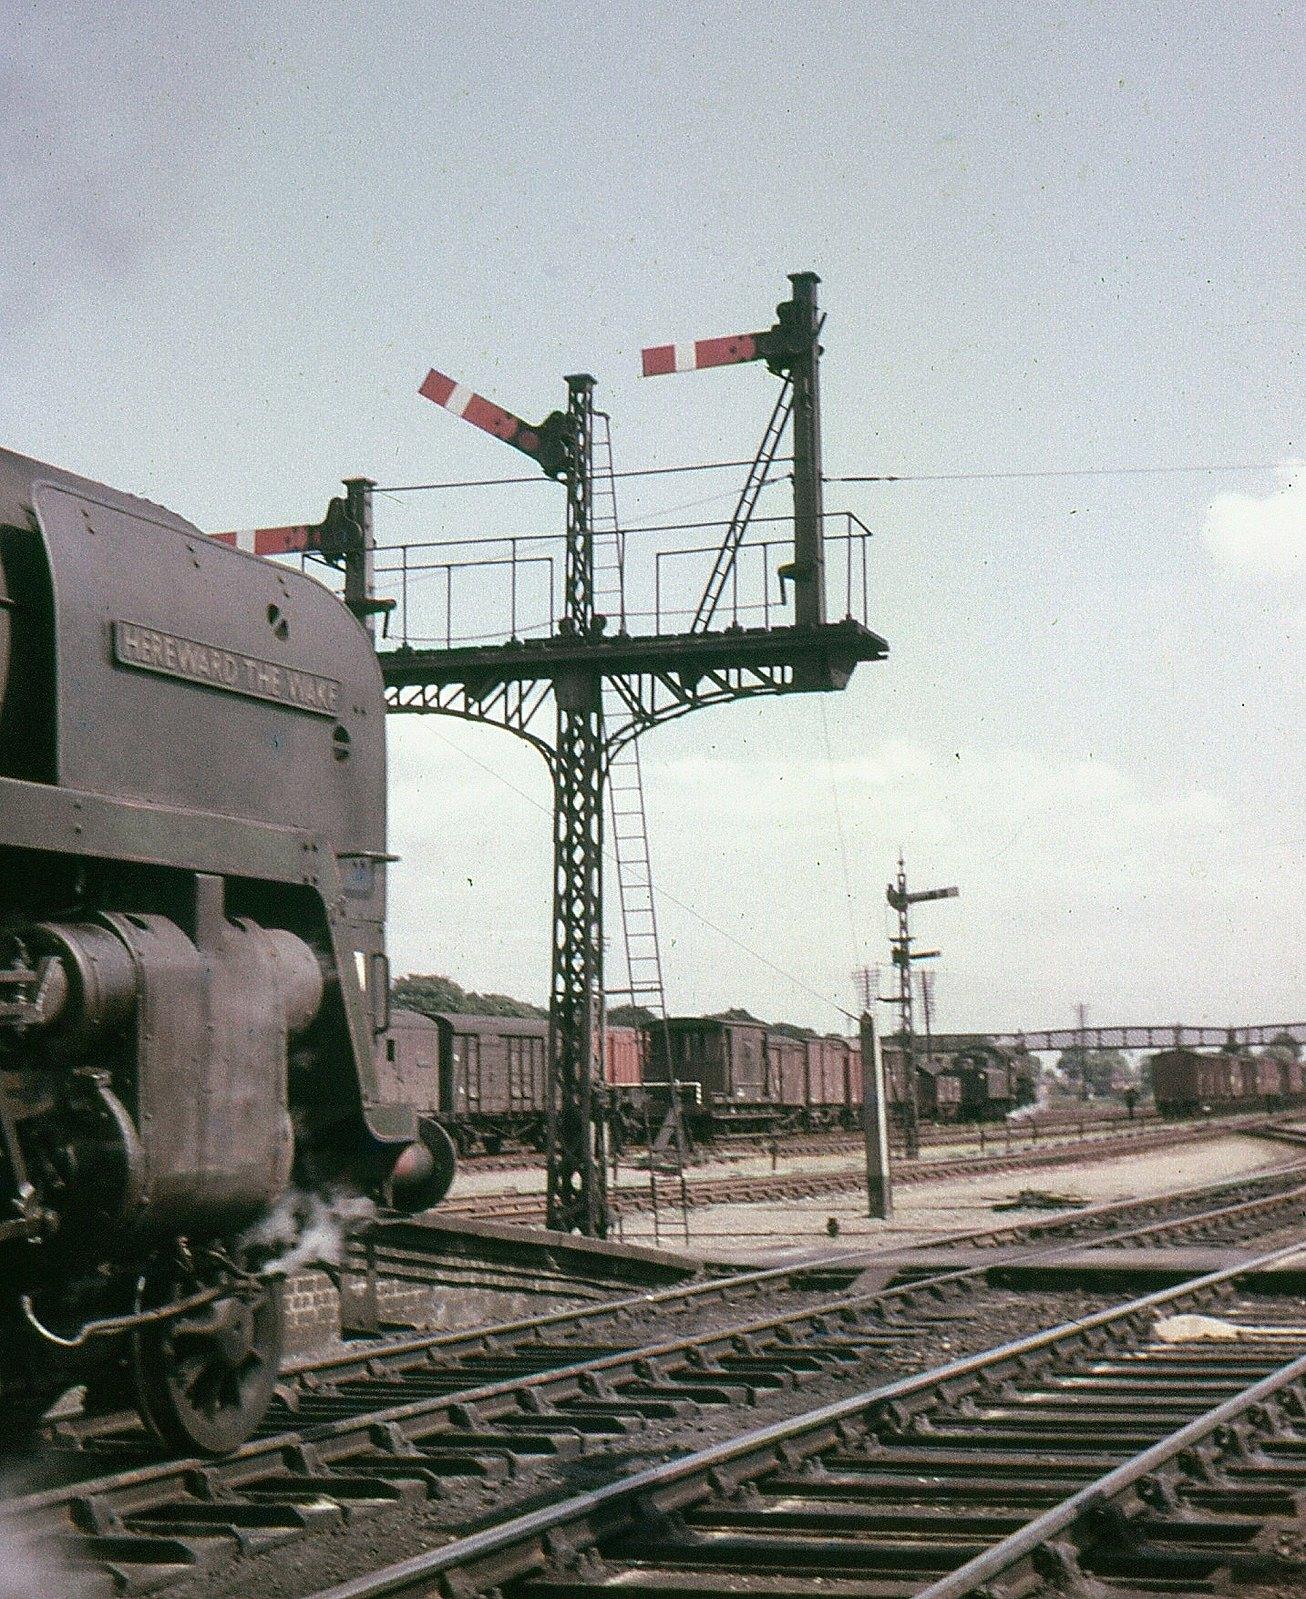 BR Class 7